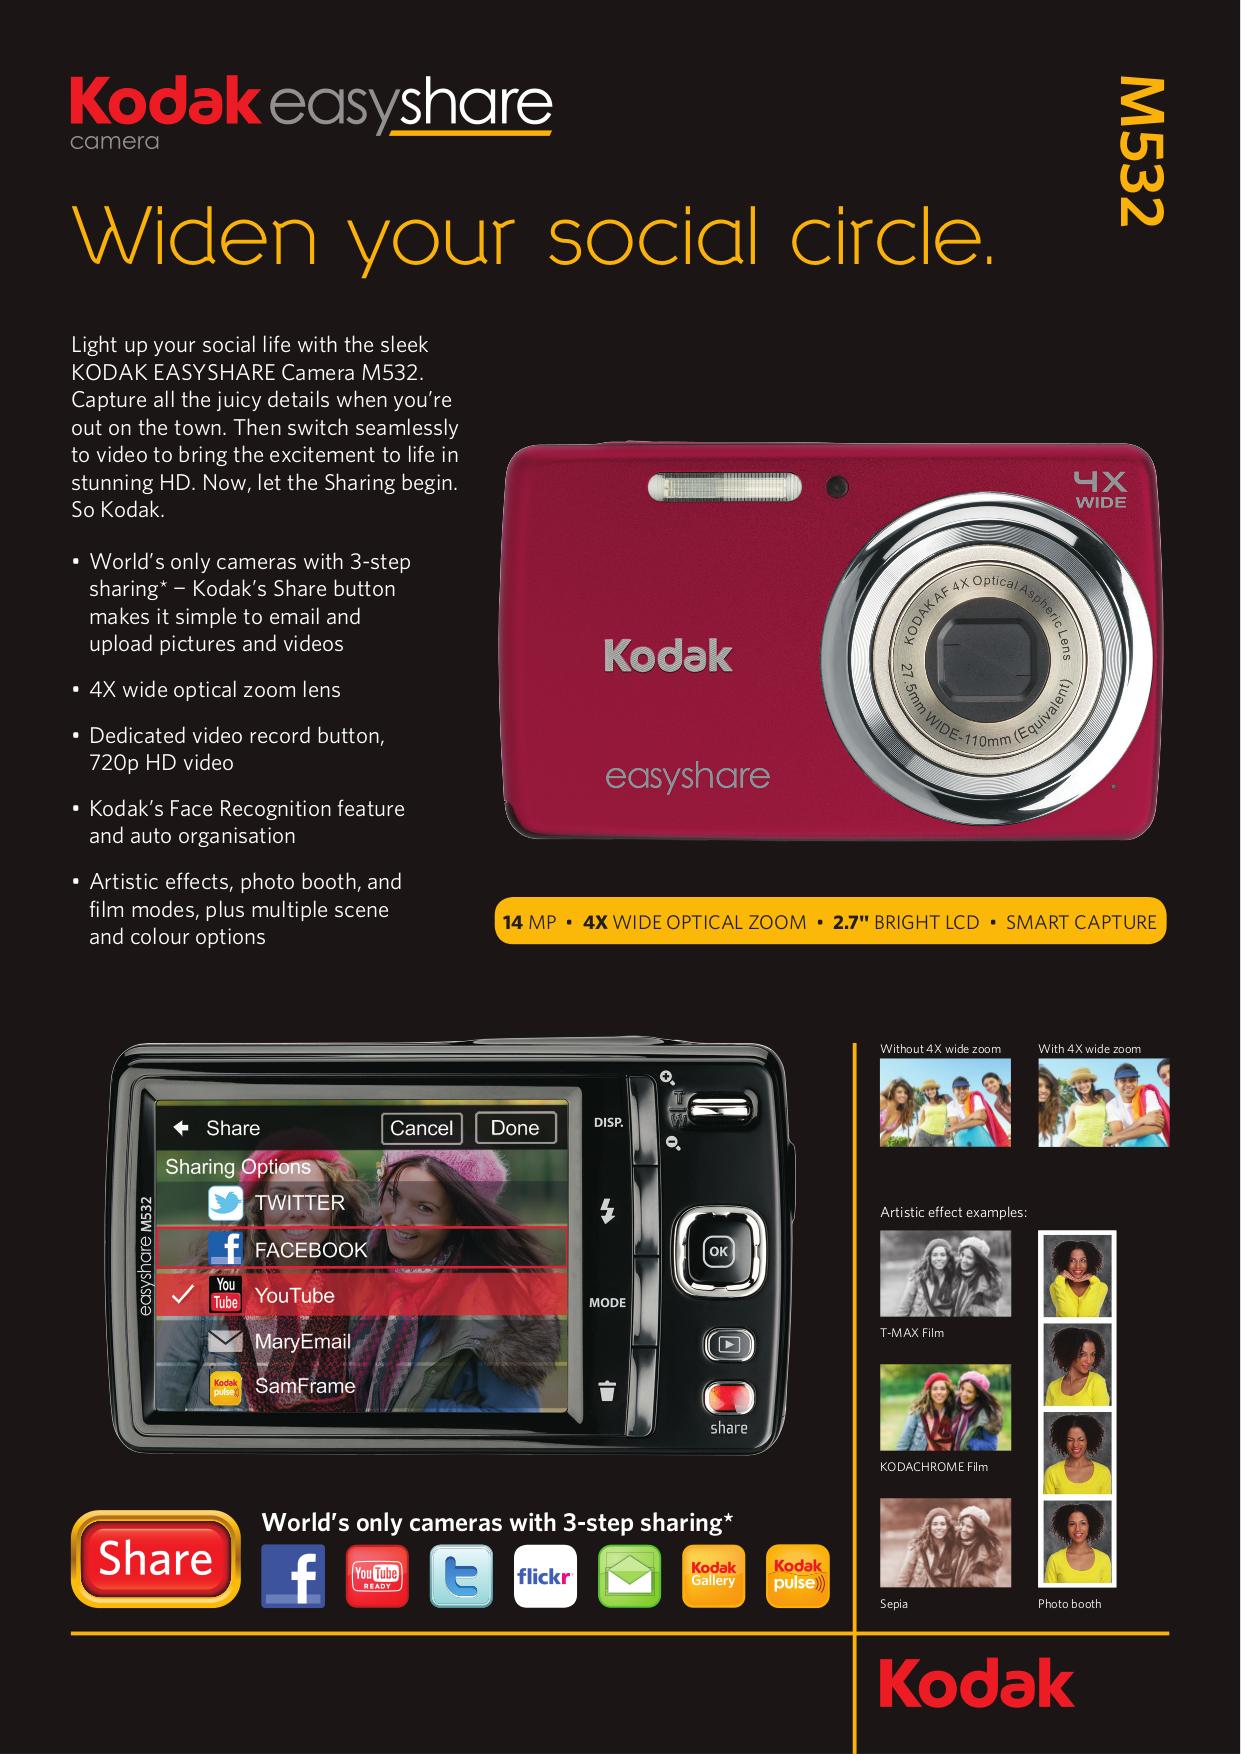 kodak easyshare m532 manual open source user manual u2022 rh dramatic varieties com kodak easyshare m532 manual en español Kodak EasyShare Printer